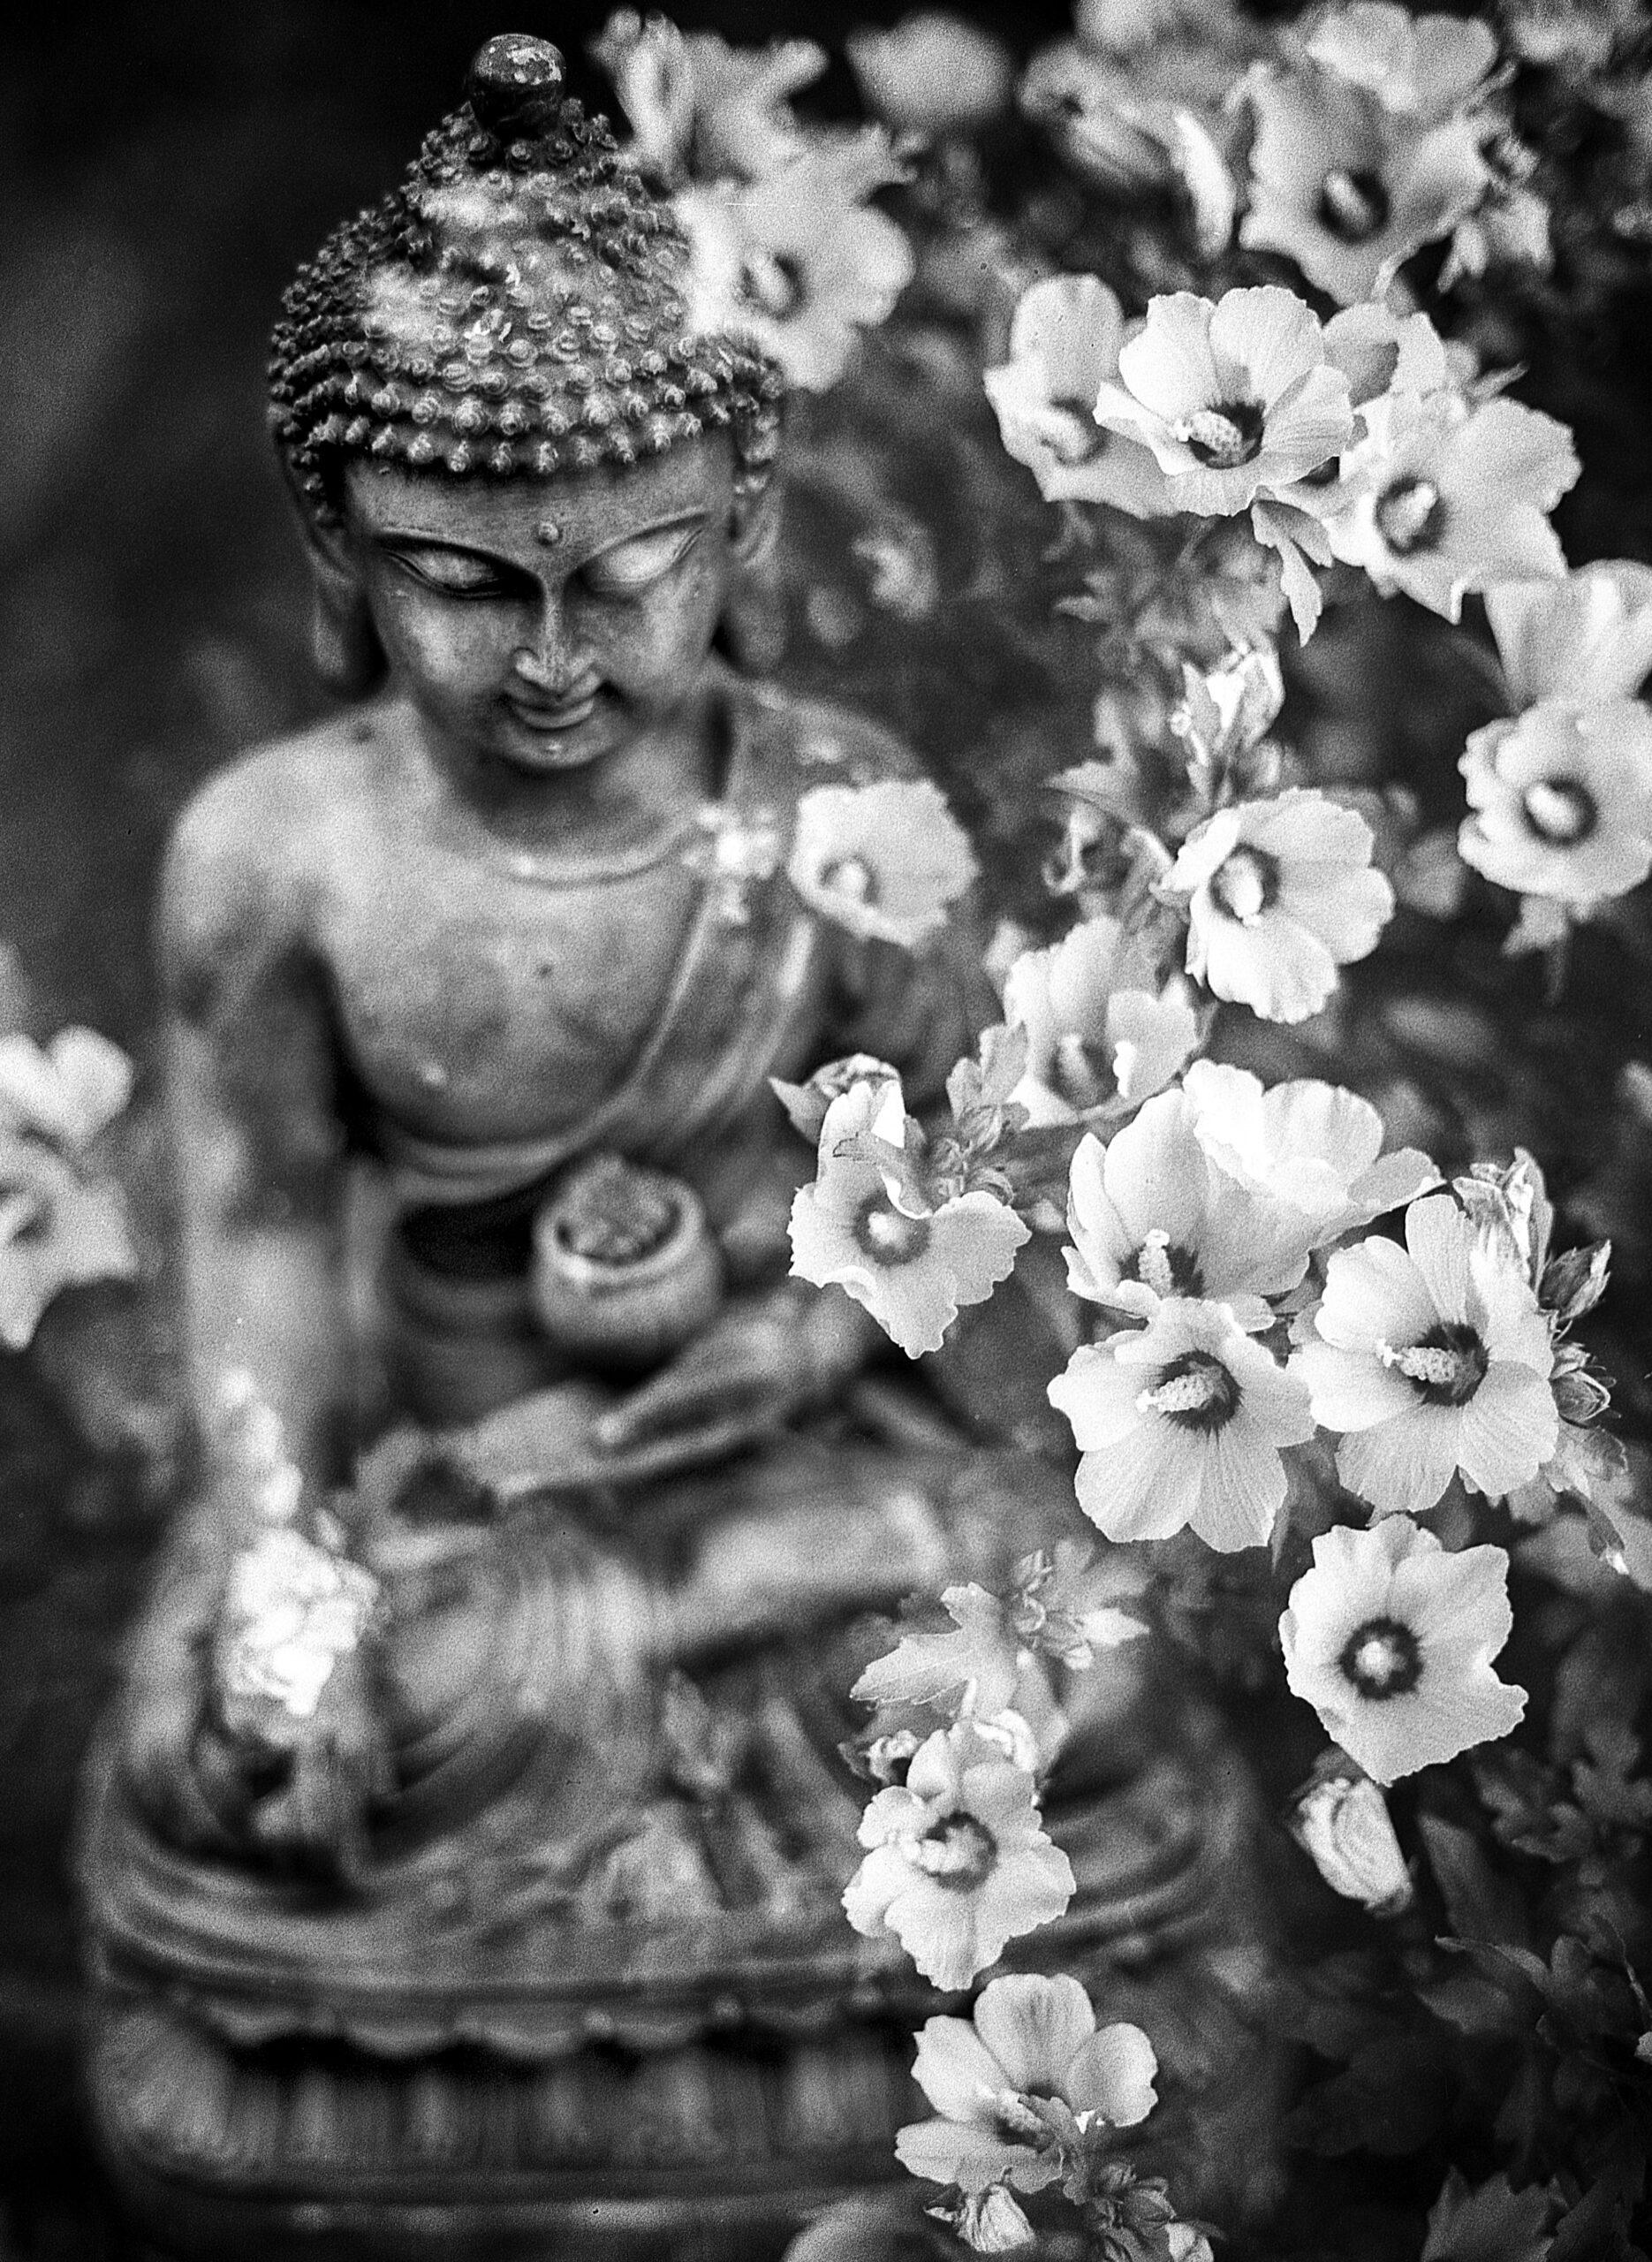 benjamin-balazs-Buddha statue graced by flowers -unsplash